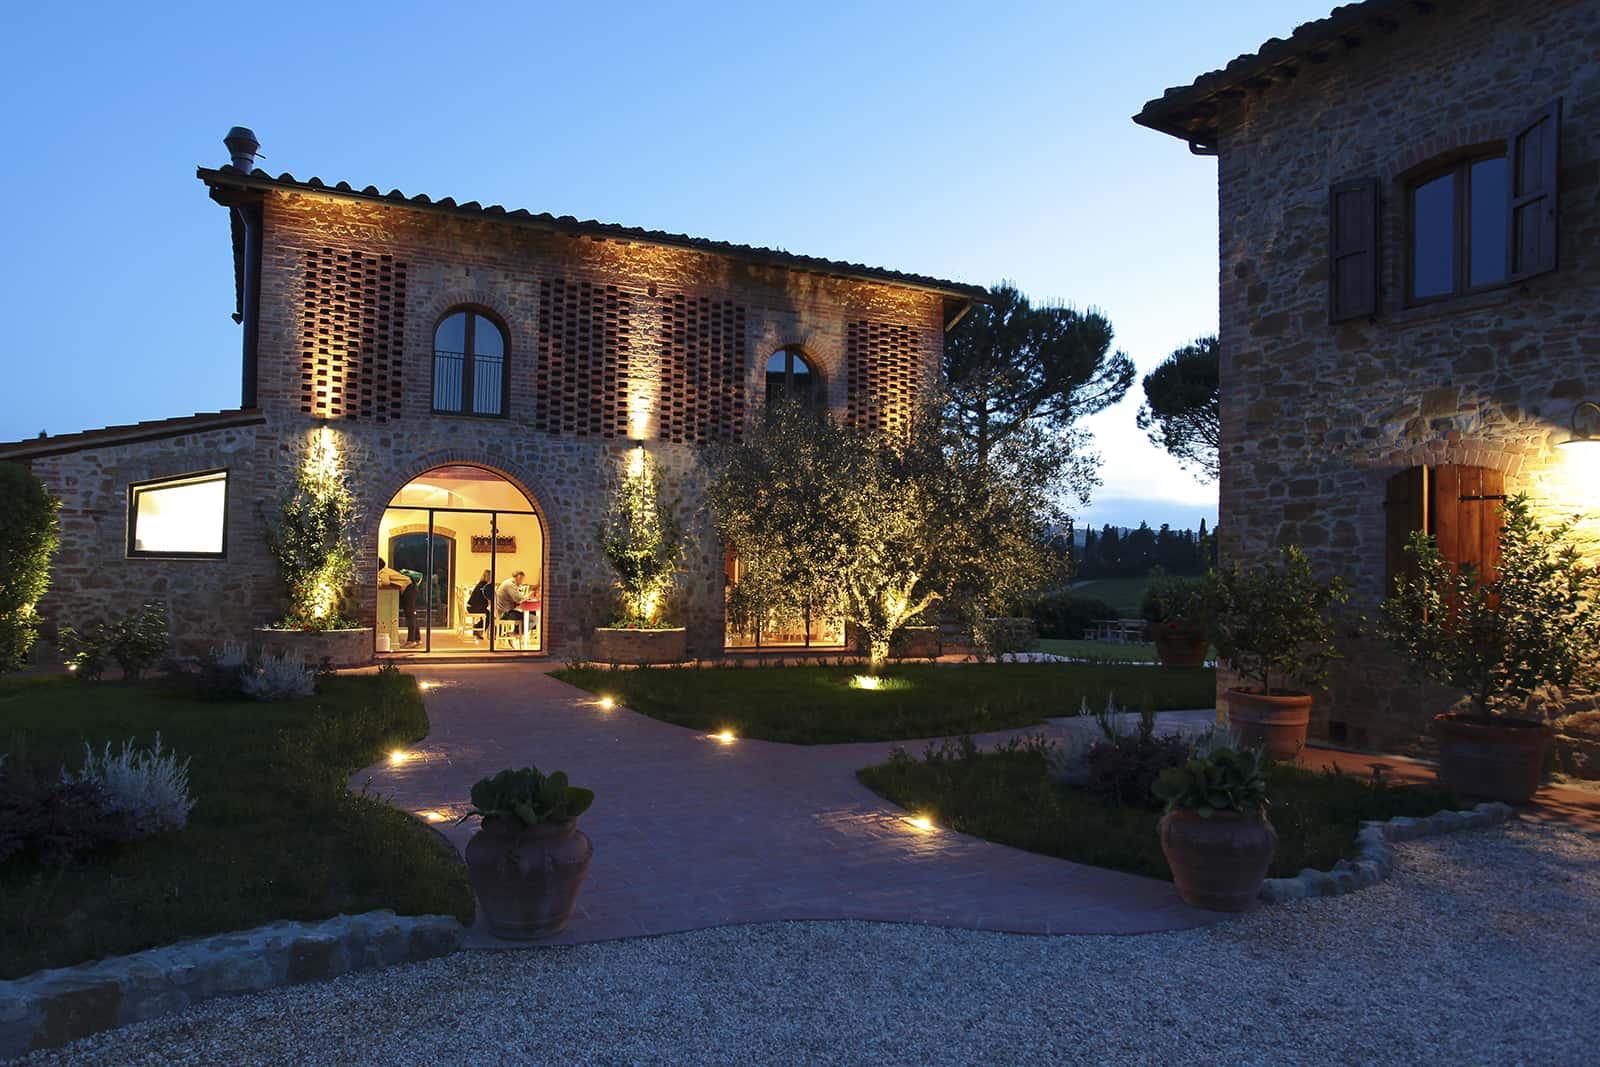 dimora-gallery-mormoraia-agriturismo-hotel-vacanza-bb-relax-casale-outdoor-18.jpg